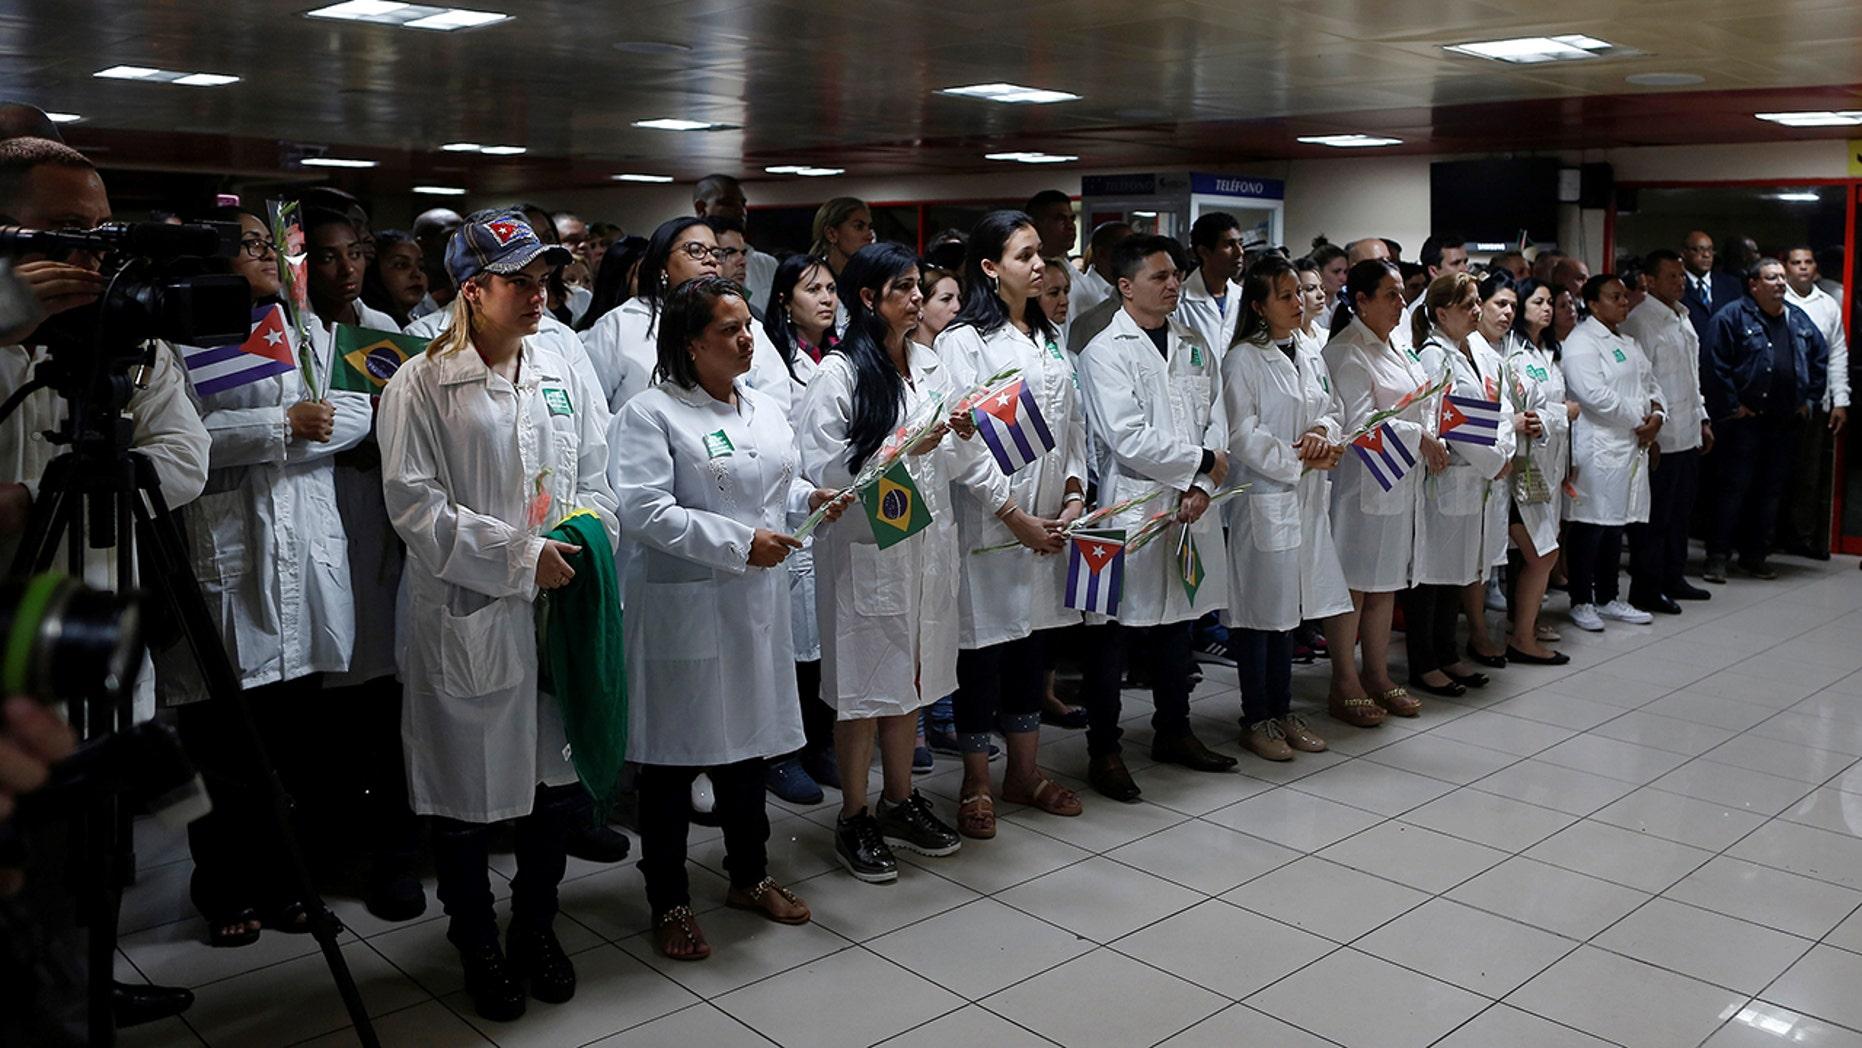 Cuban doctors at the Jose Marti International Airport in Havana, Cuba on November 23, 2018. REUTERS/Fernando Medina